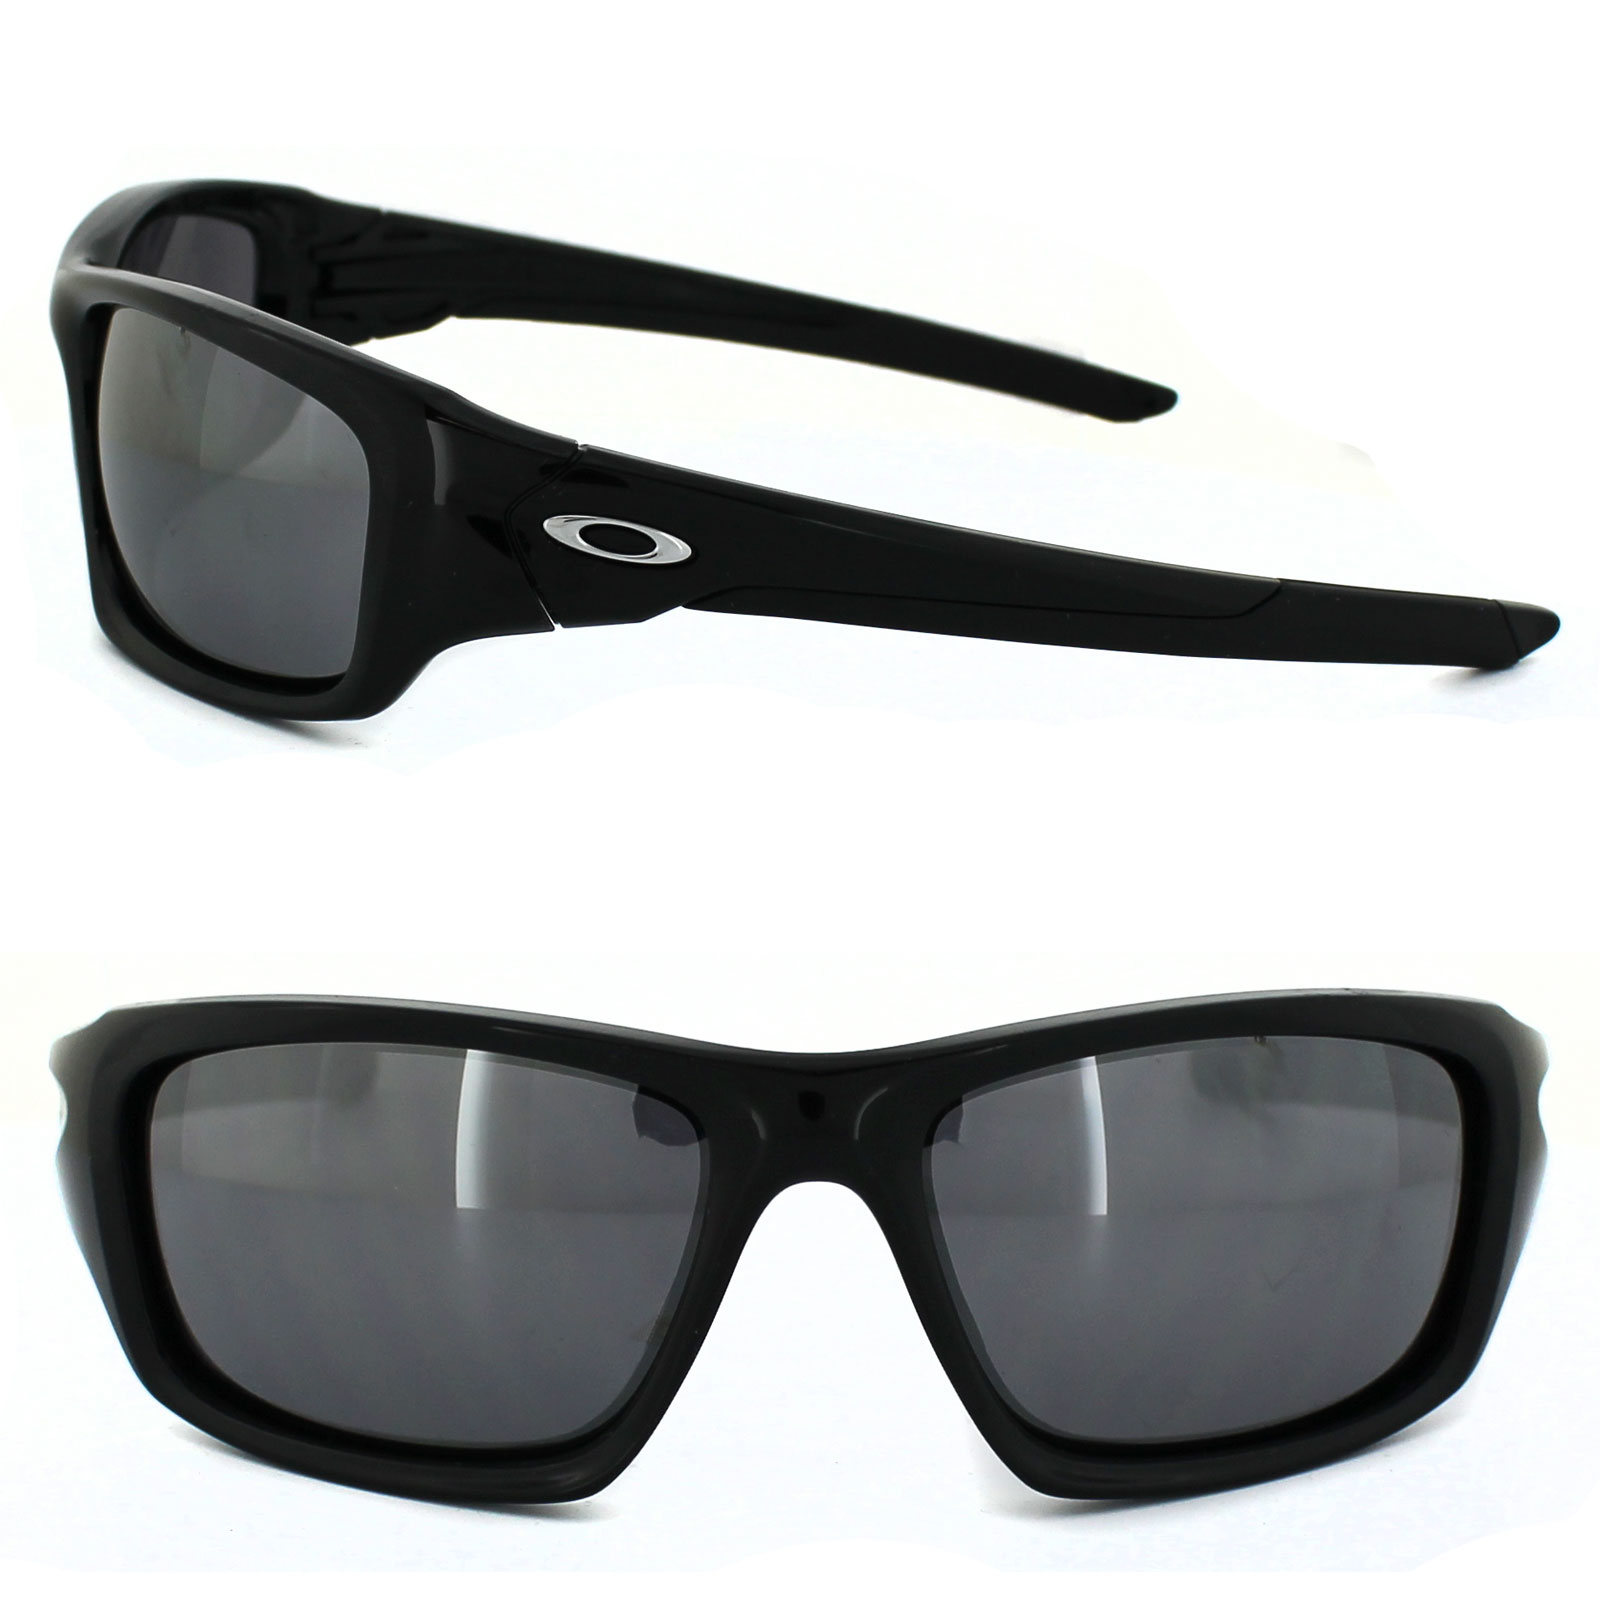 Oakley Glasses Discount